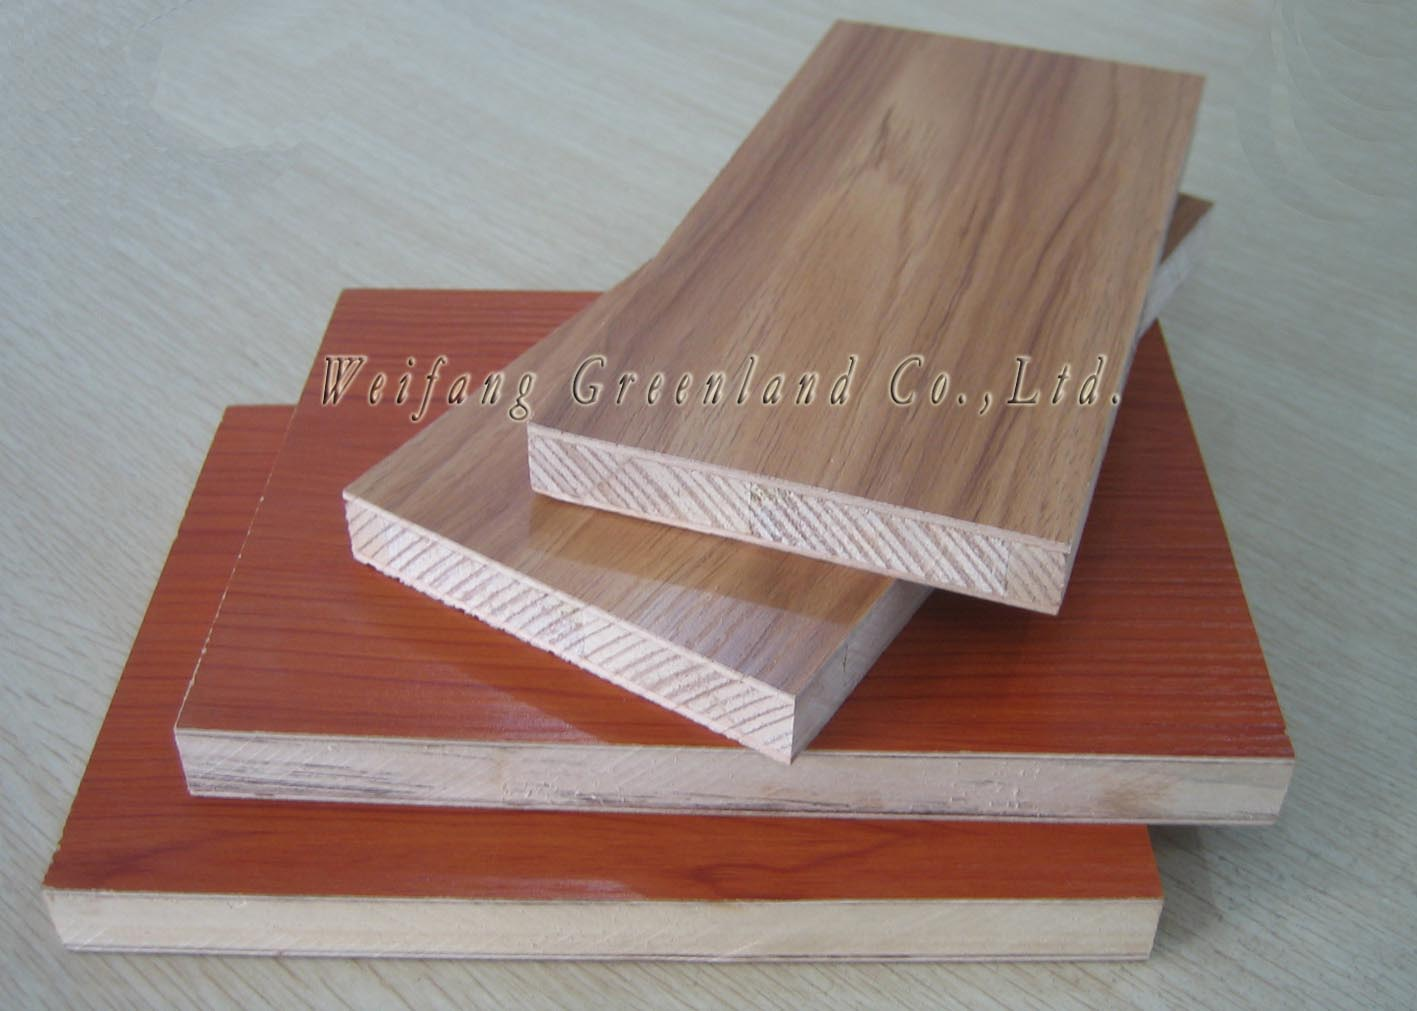 Melamine block board weifang greenland co ltd